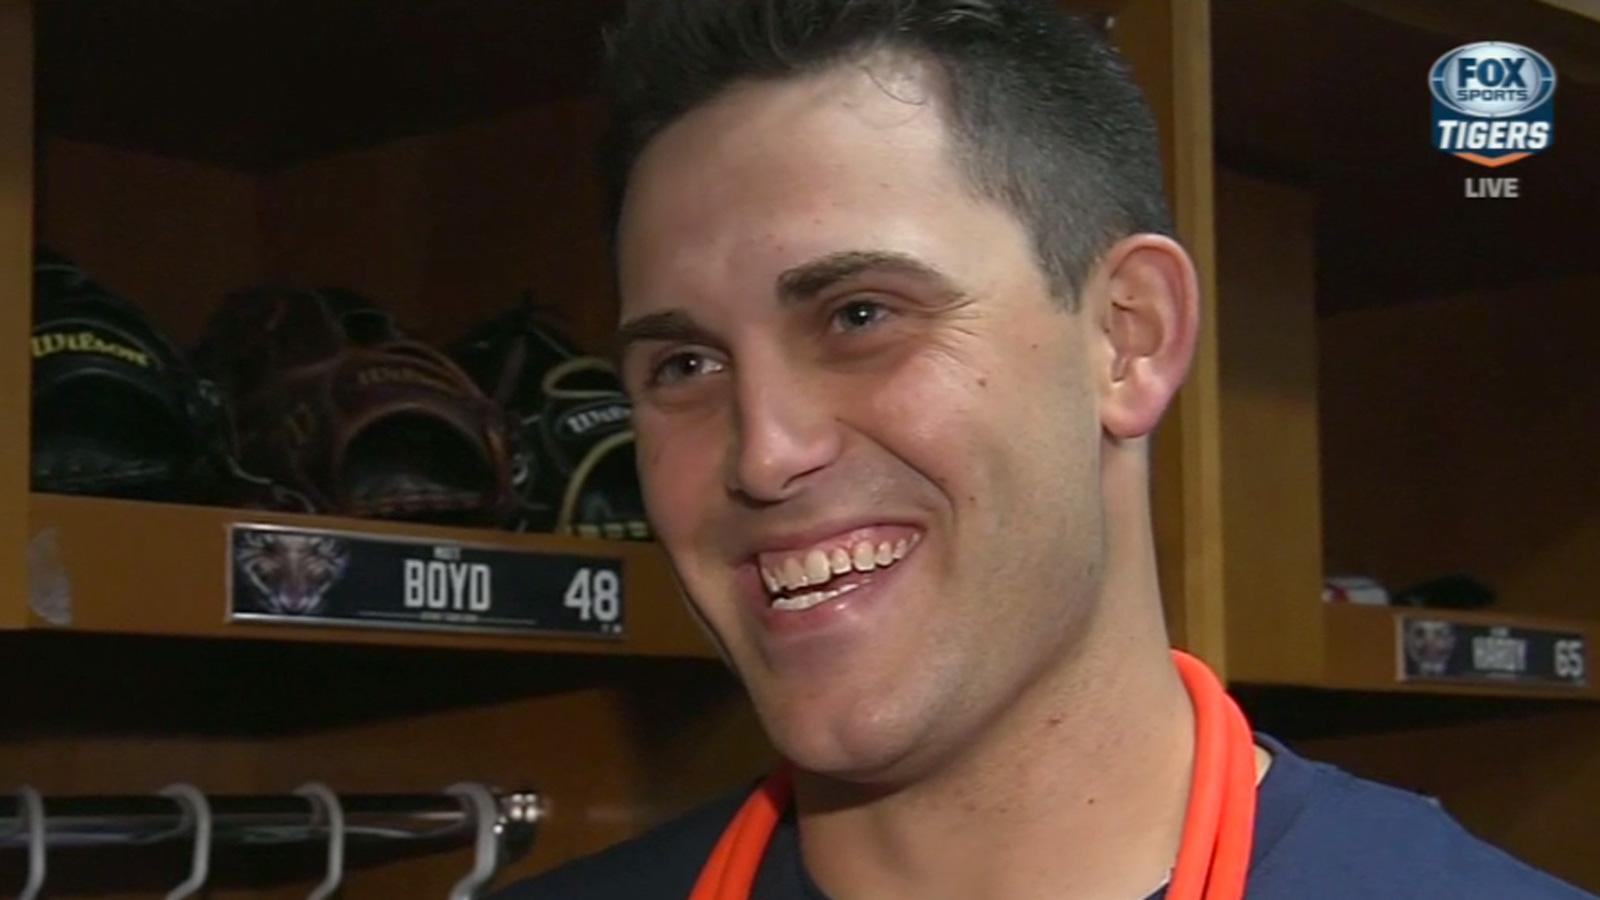 Tigers Pregame 8.16.15: Matt Boyd (VIDEO)